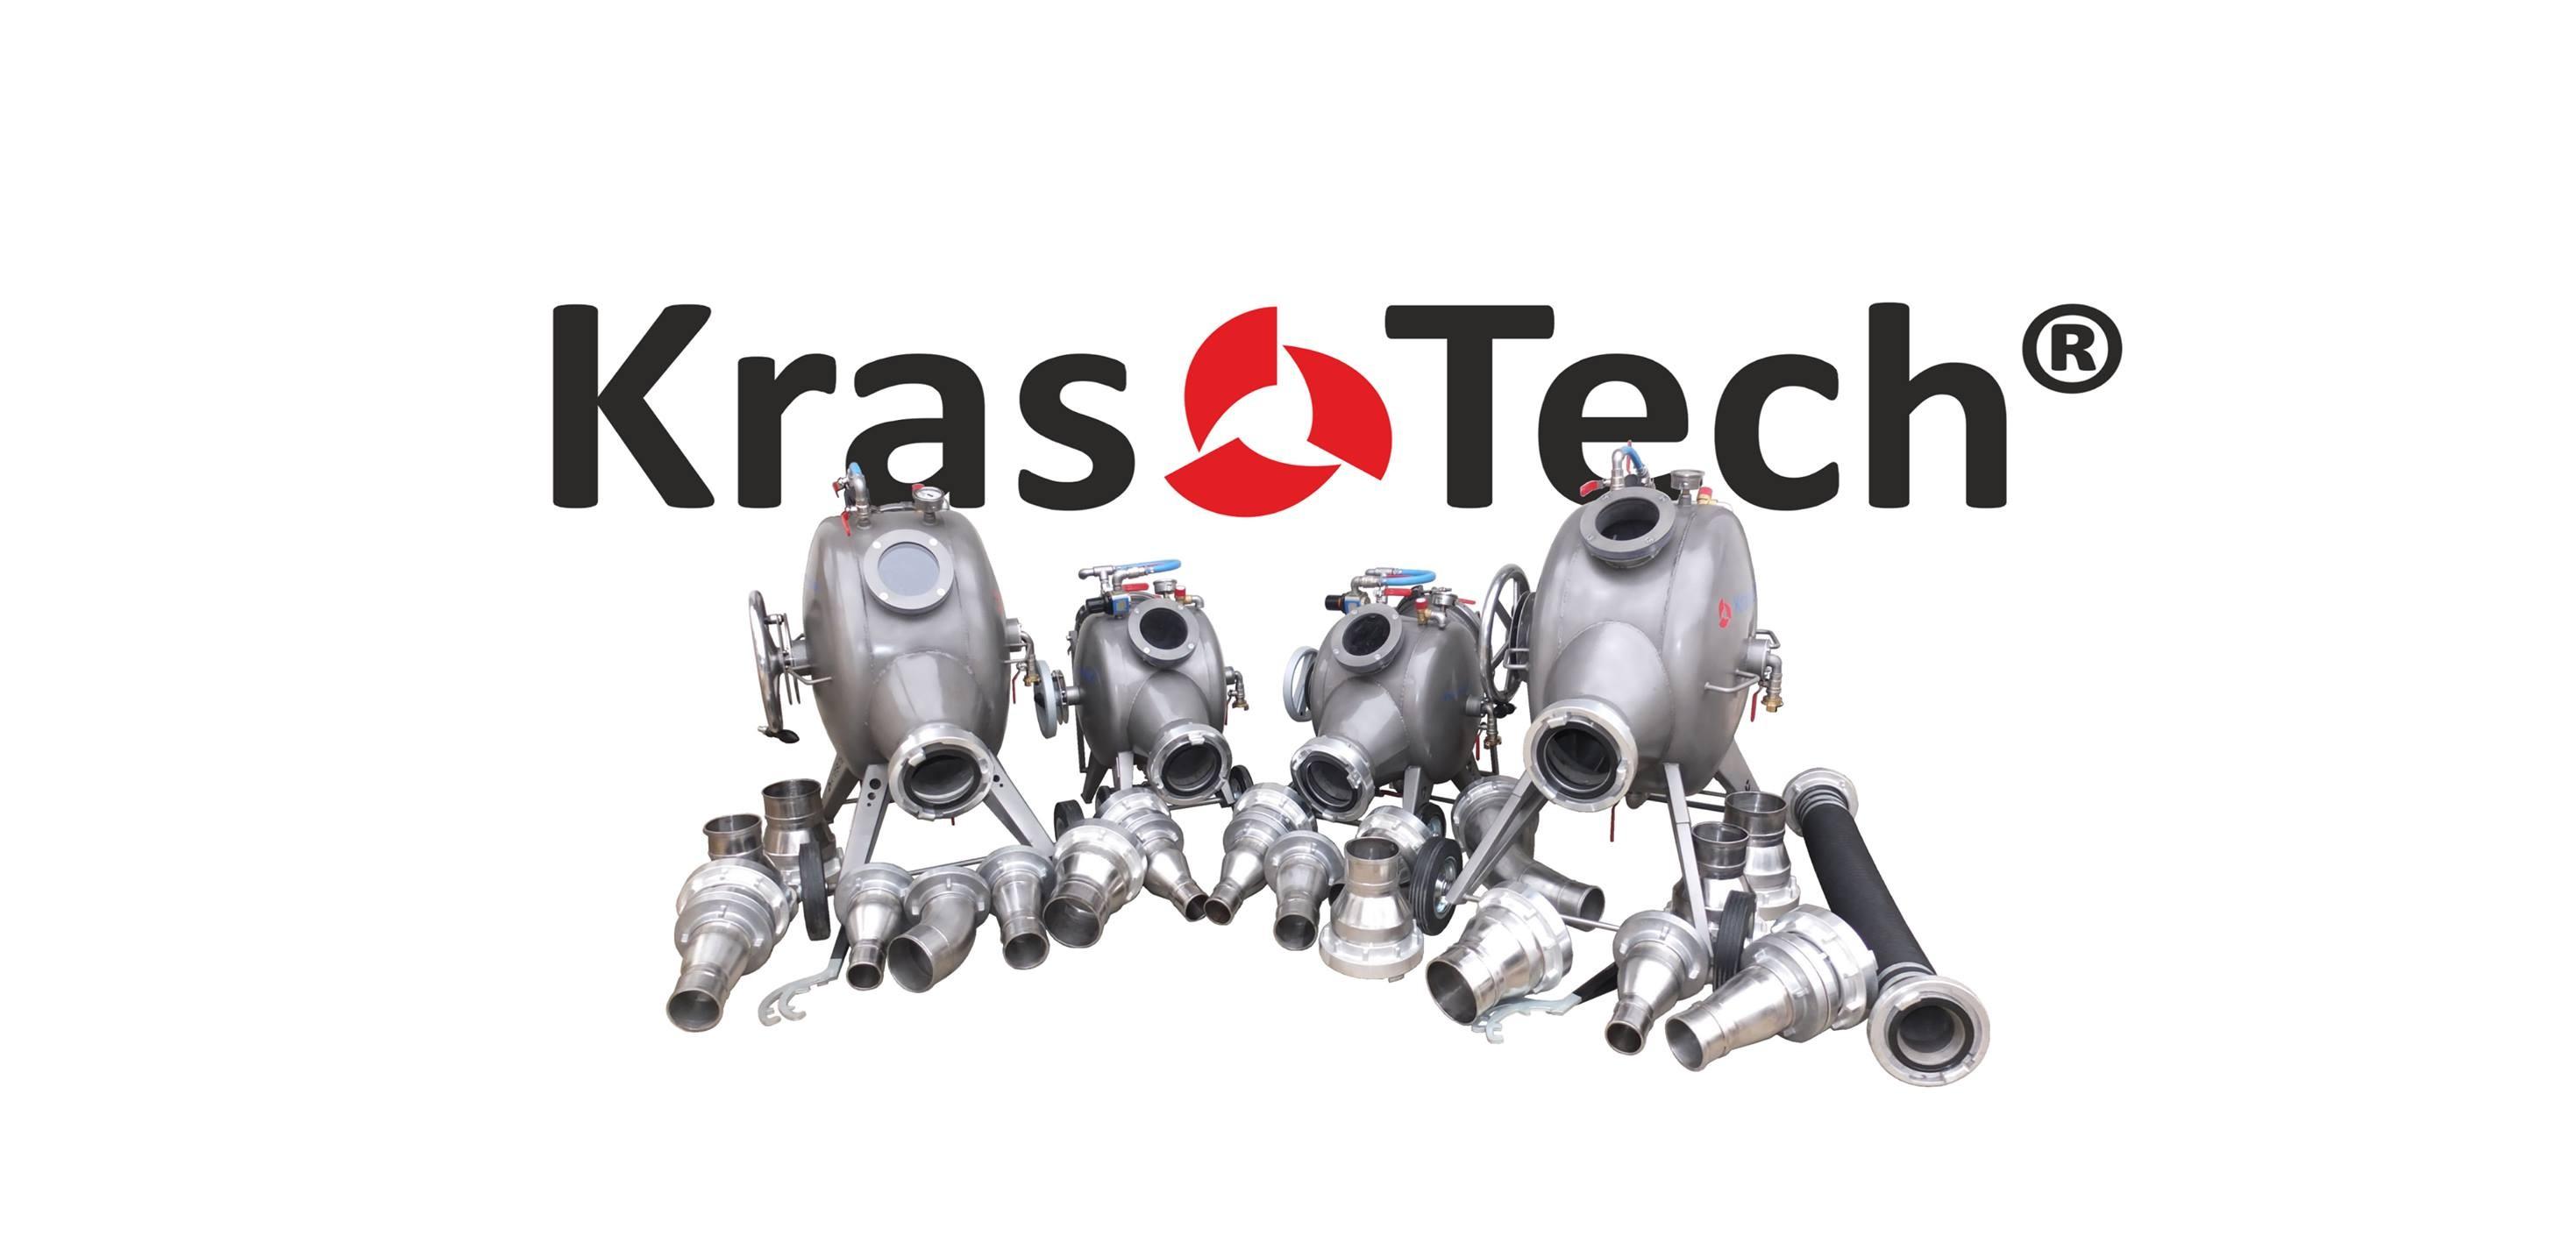 KrasTech